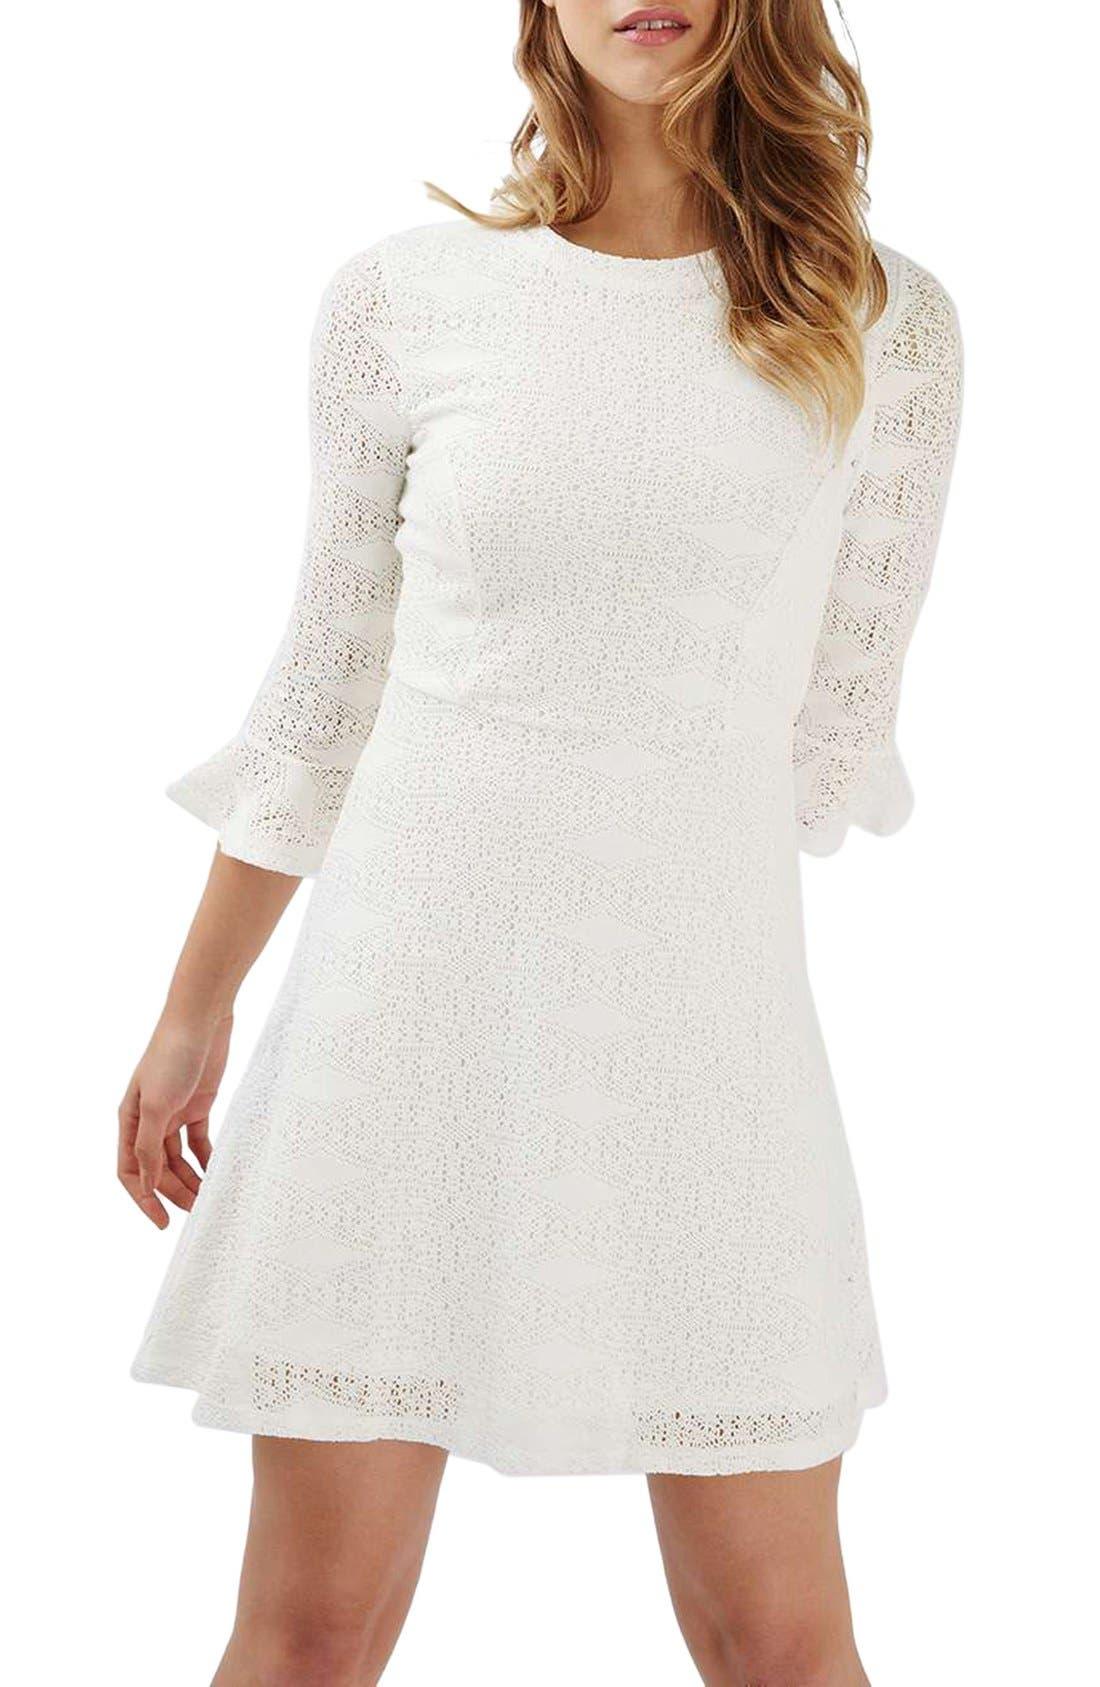 Alternate Image 1 Selected - Topshop Flute Sleeve Crochet Dress